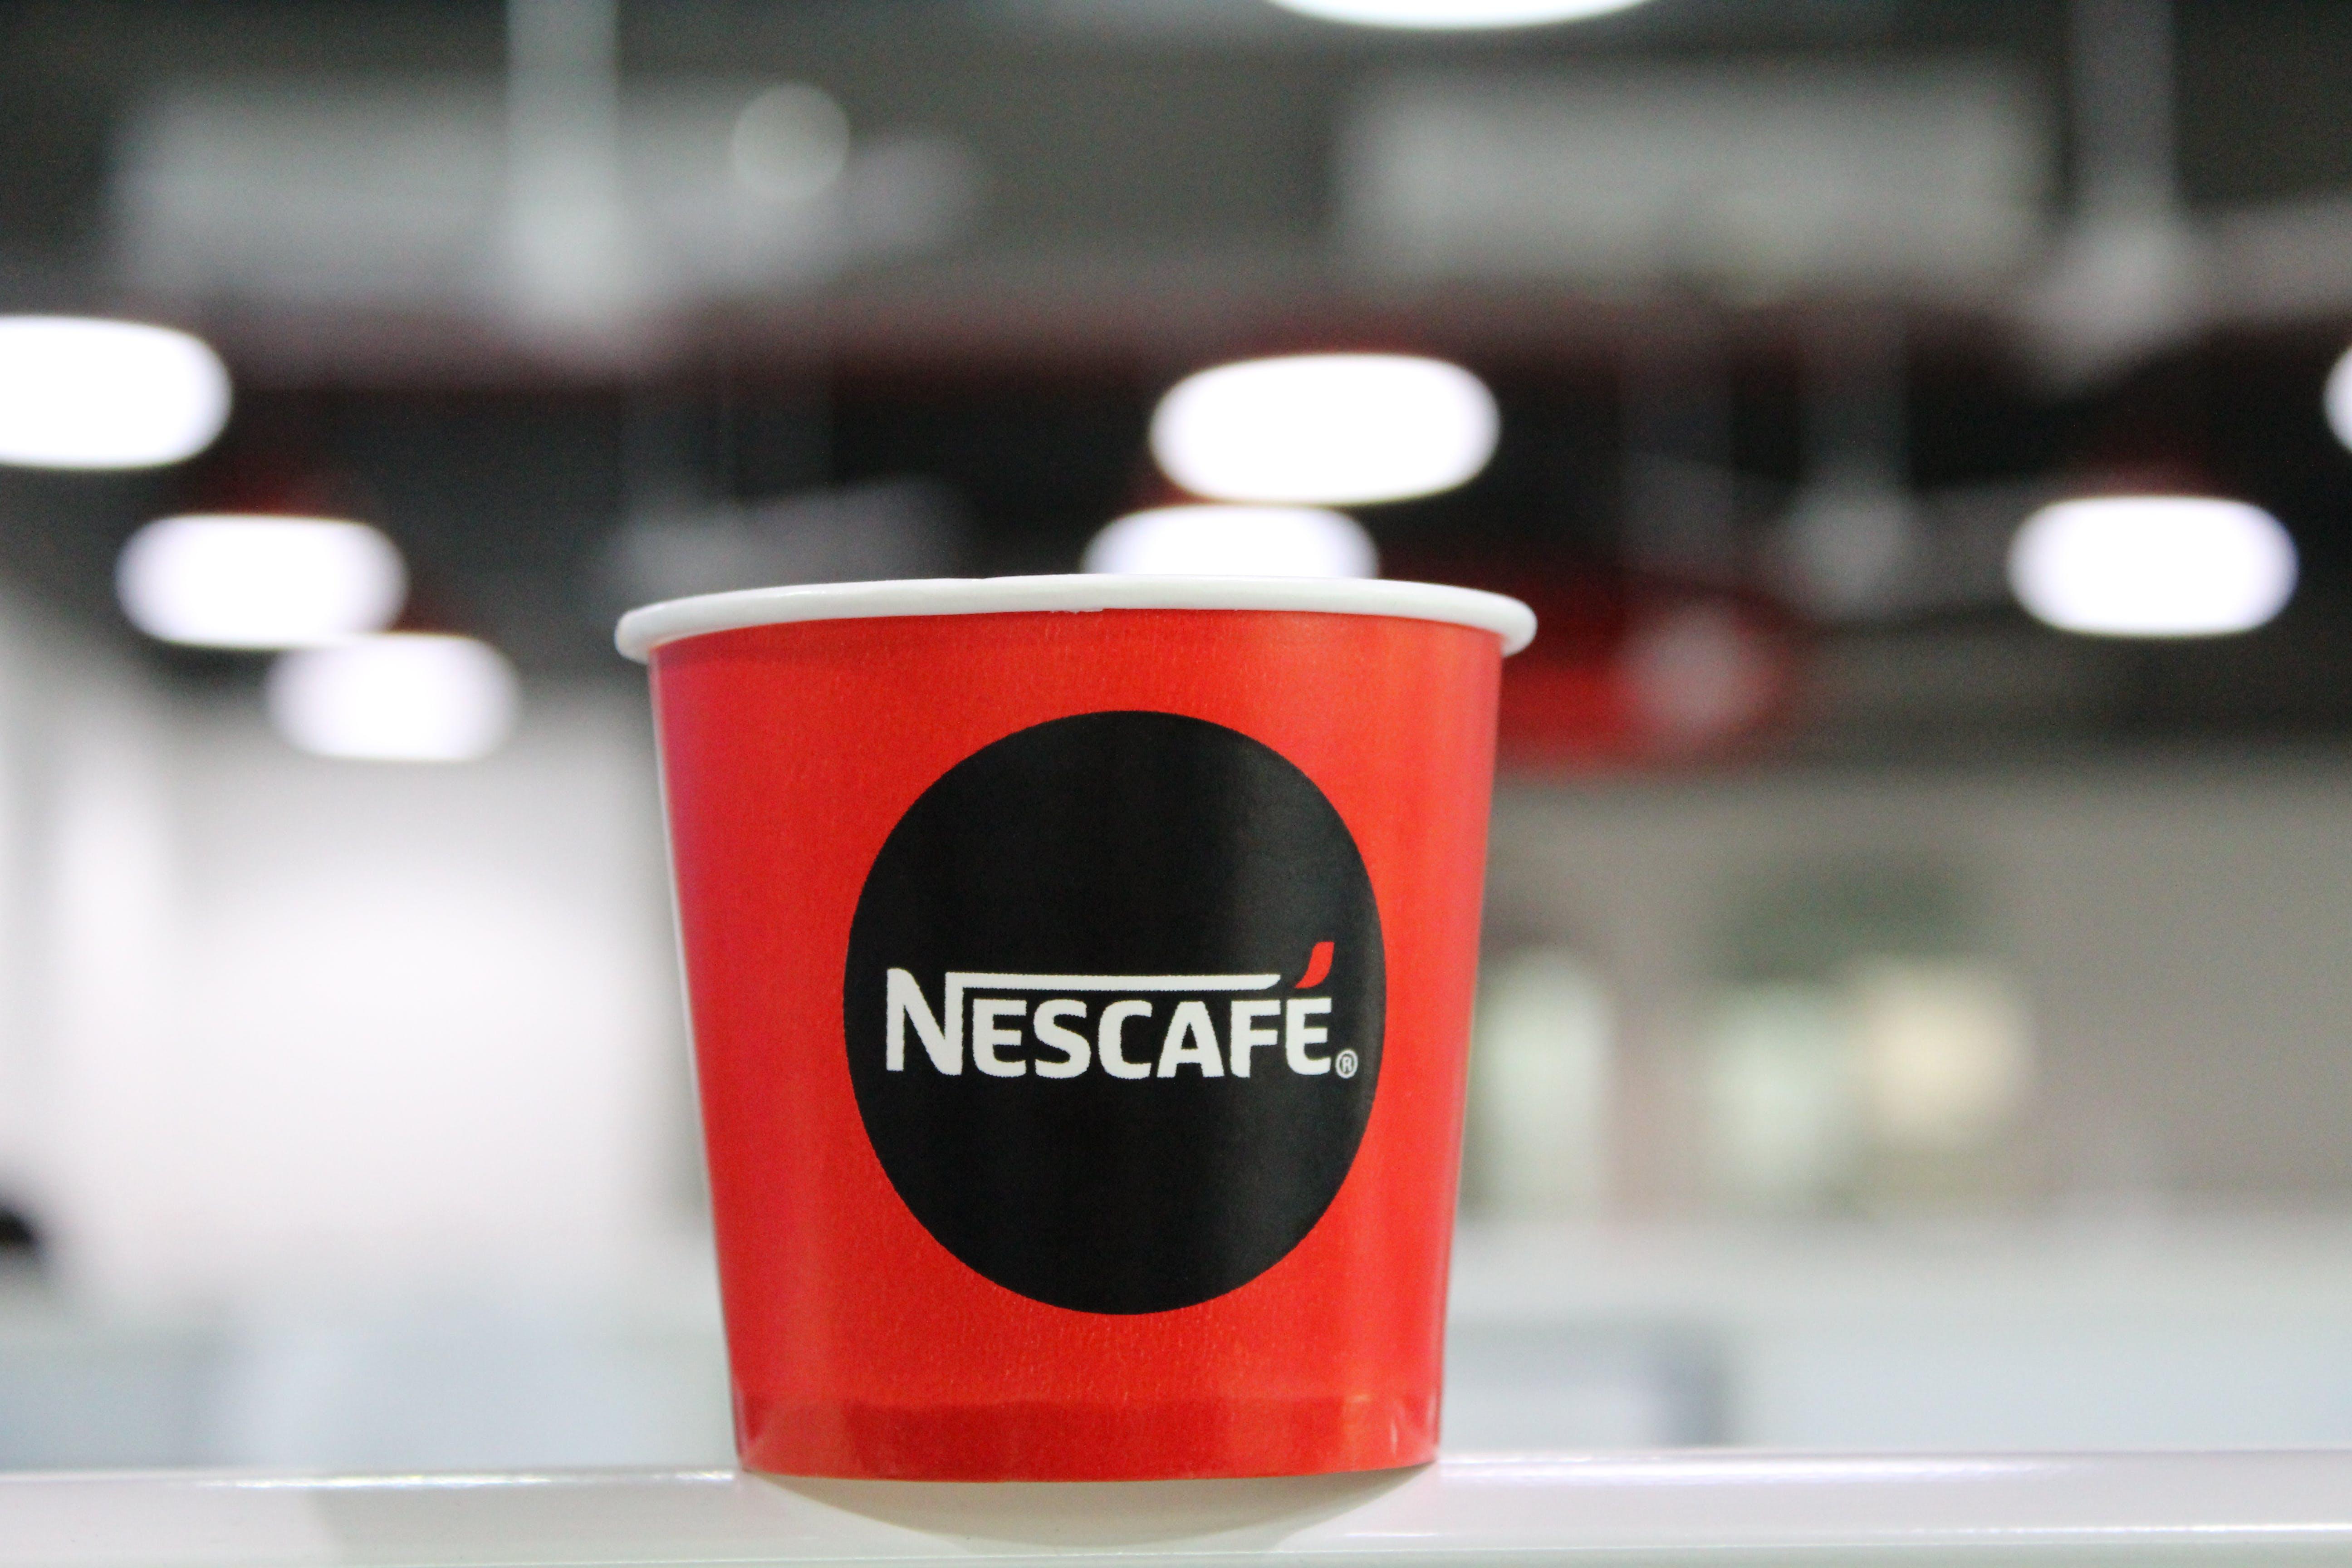 Fotos de stock gratuitas de atractivo, beber, café, café exprés